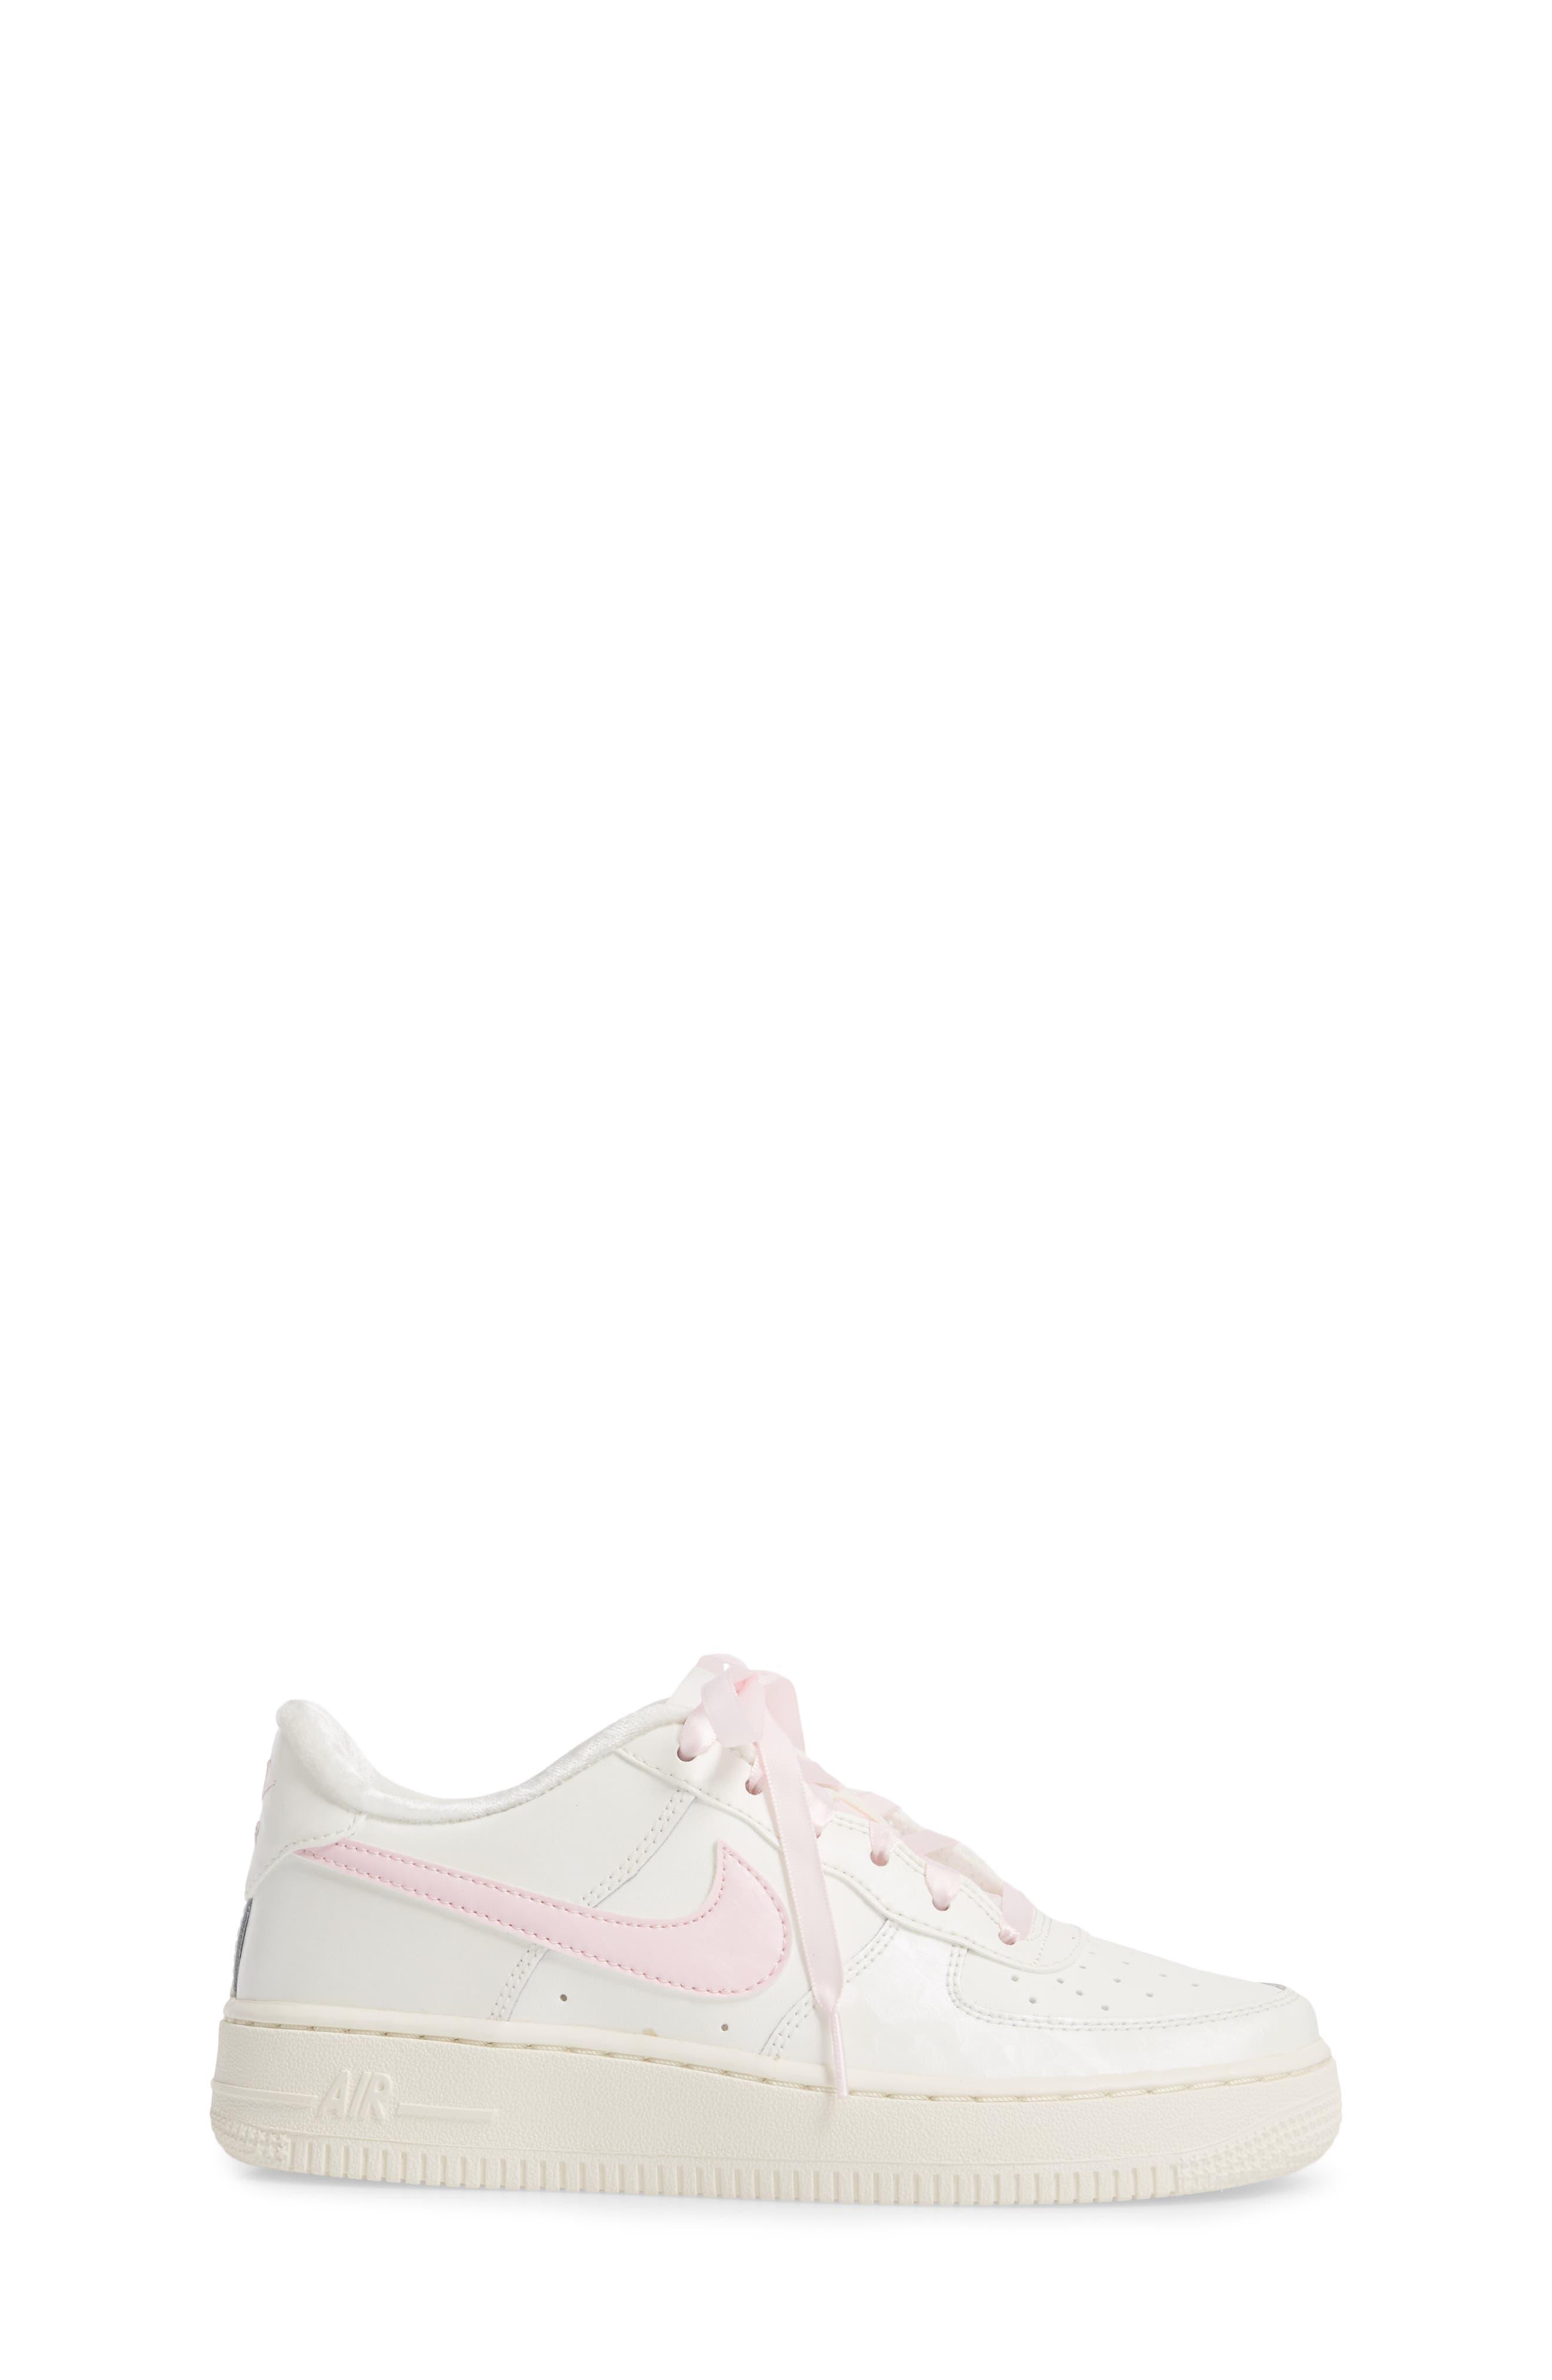 Air Force 1 '06 Sneaker,                             Alternate thumbnail 3, color,                             Sail/ Arctic Pink